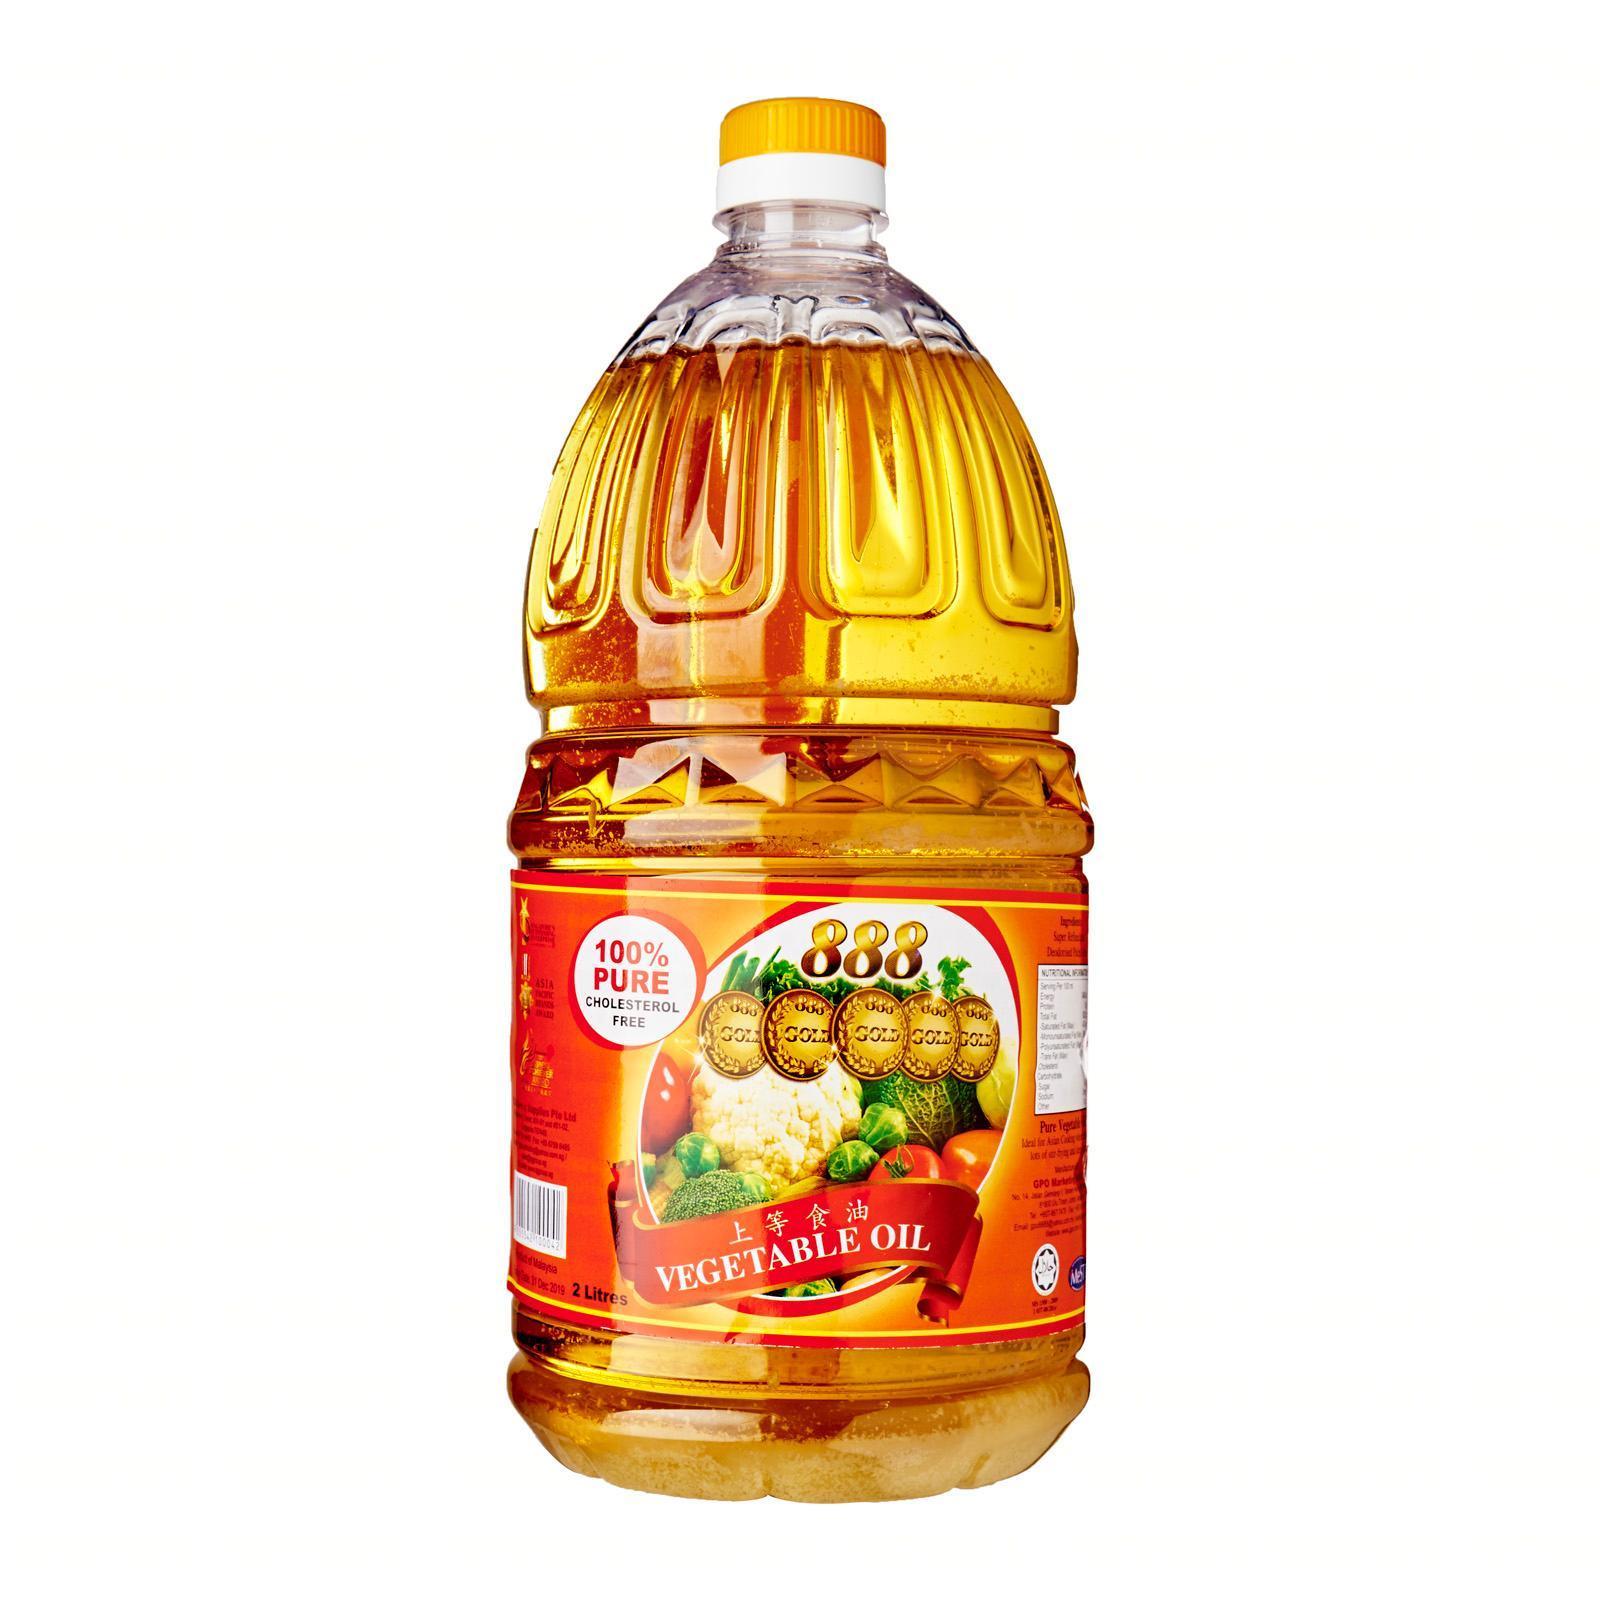 888 Vegetable Oil (2l) By Redmart.